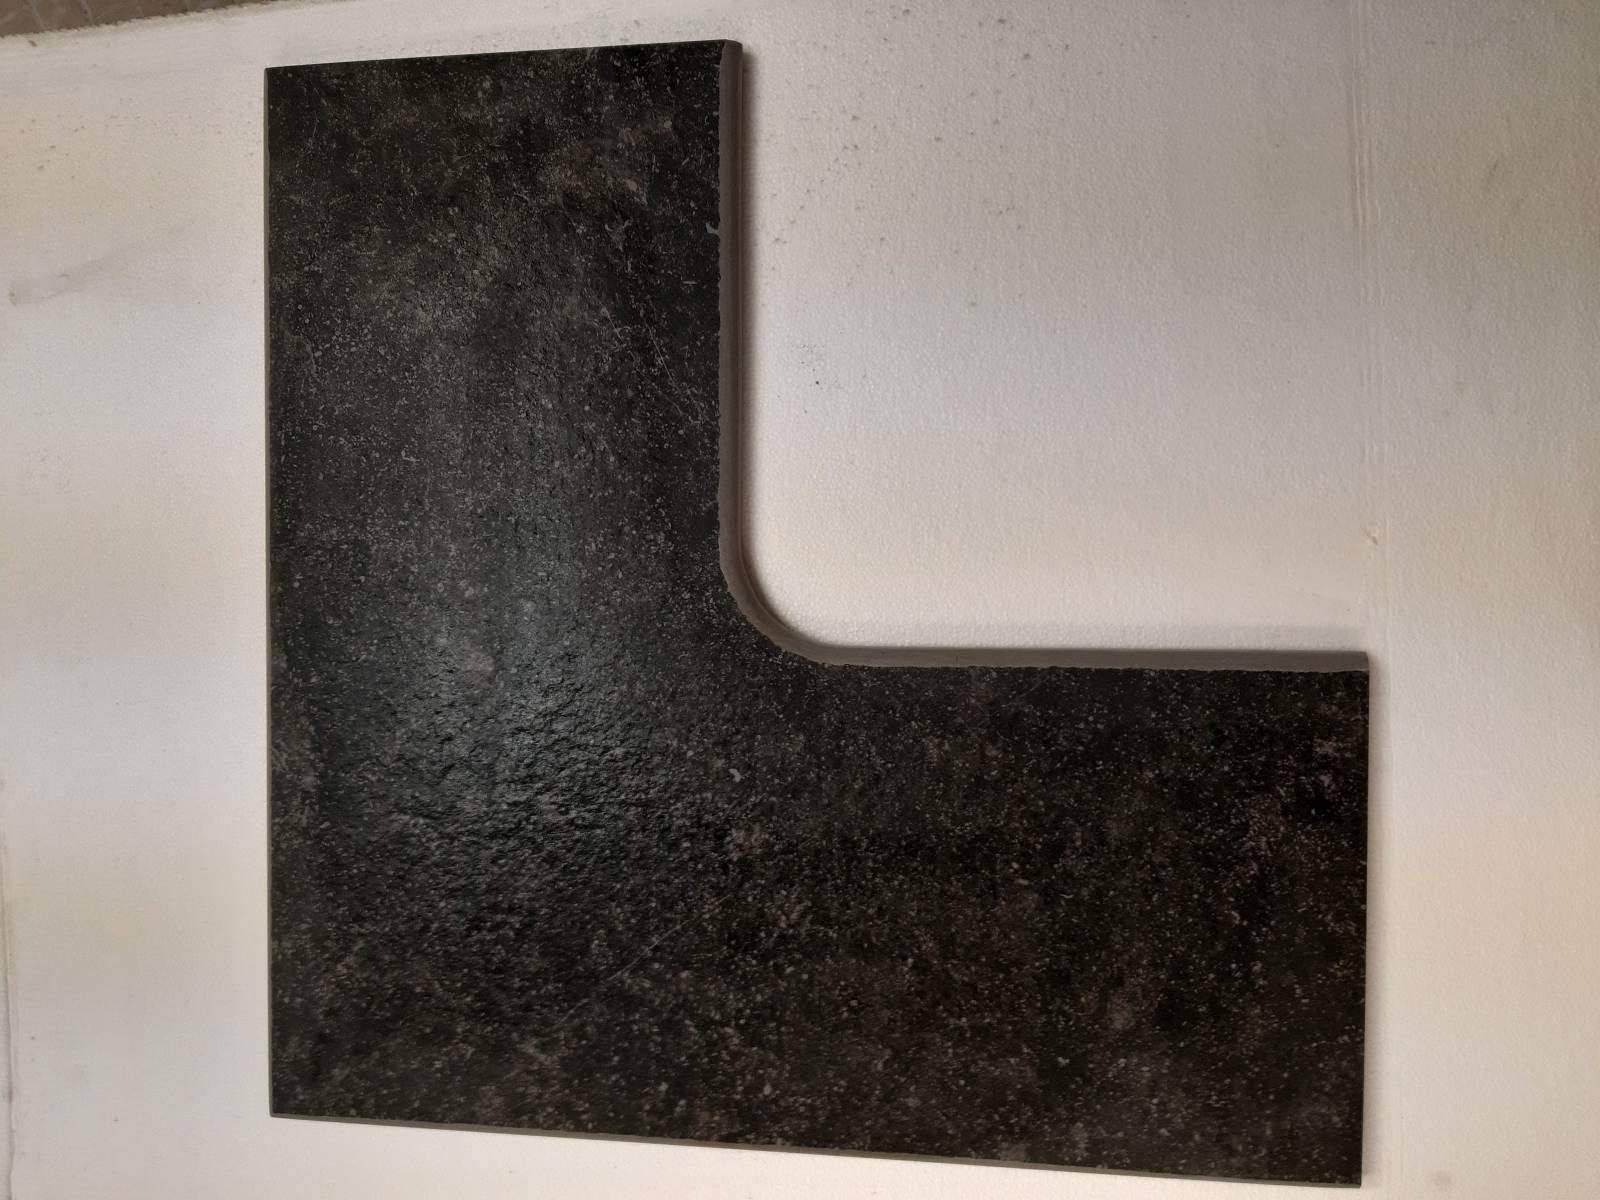 Pièce Angle façonnée 2 côtés (2)